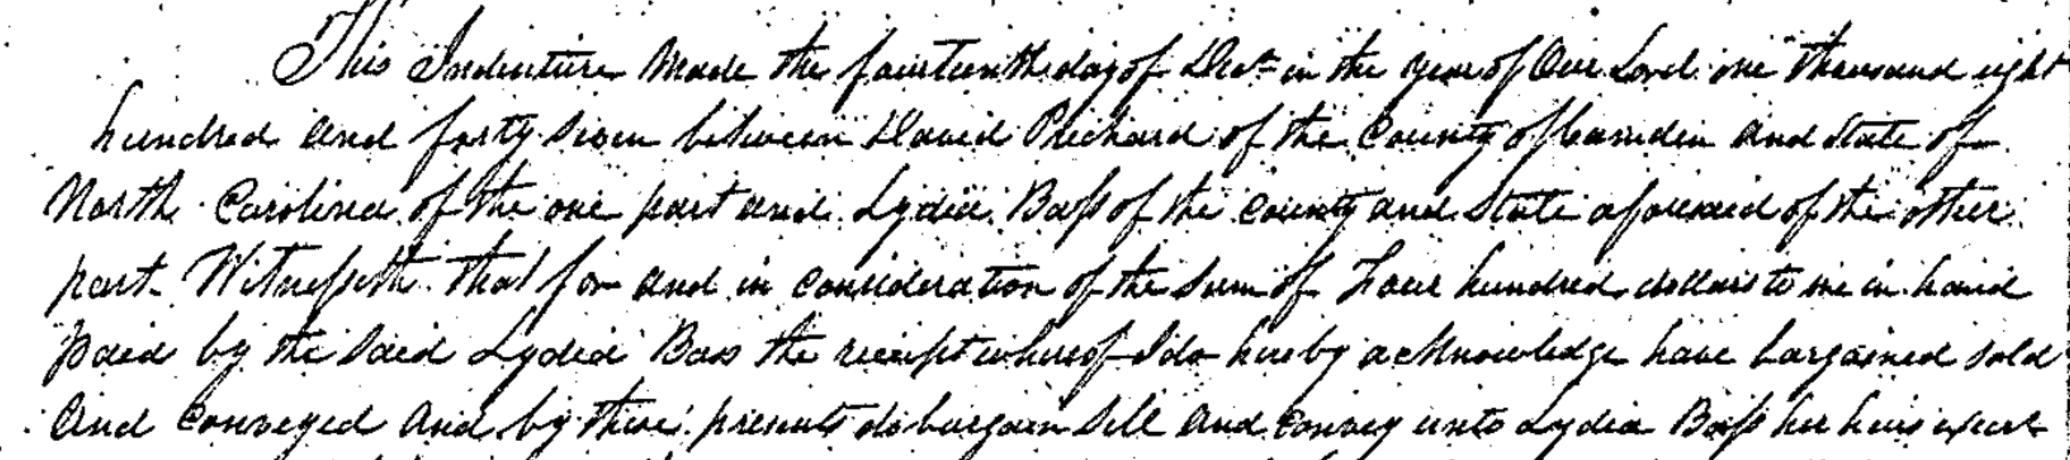 David Pritchard Lydia Bass 1847 Deed.png